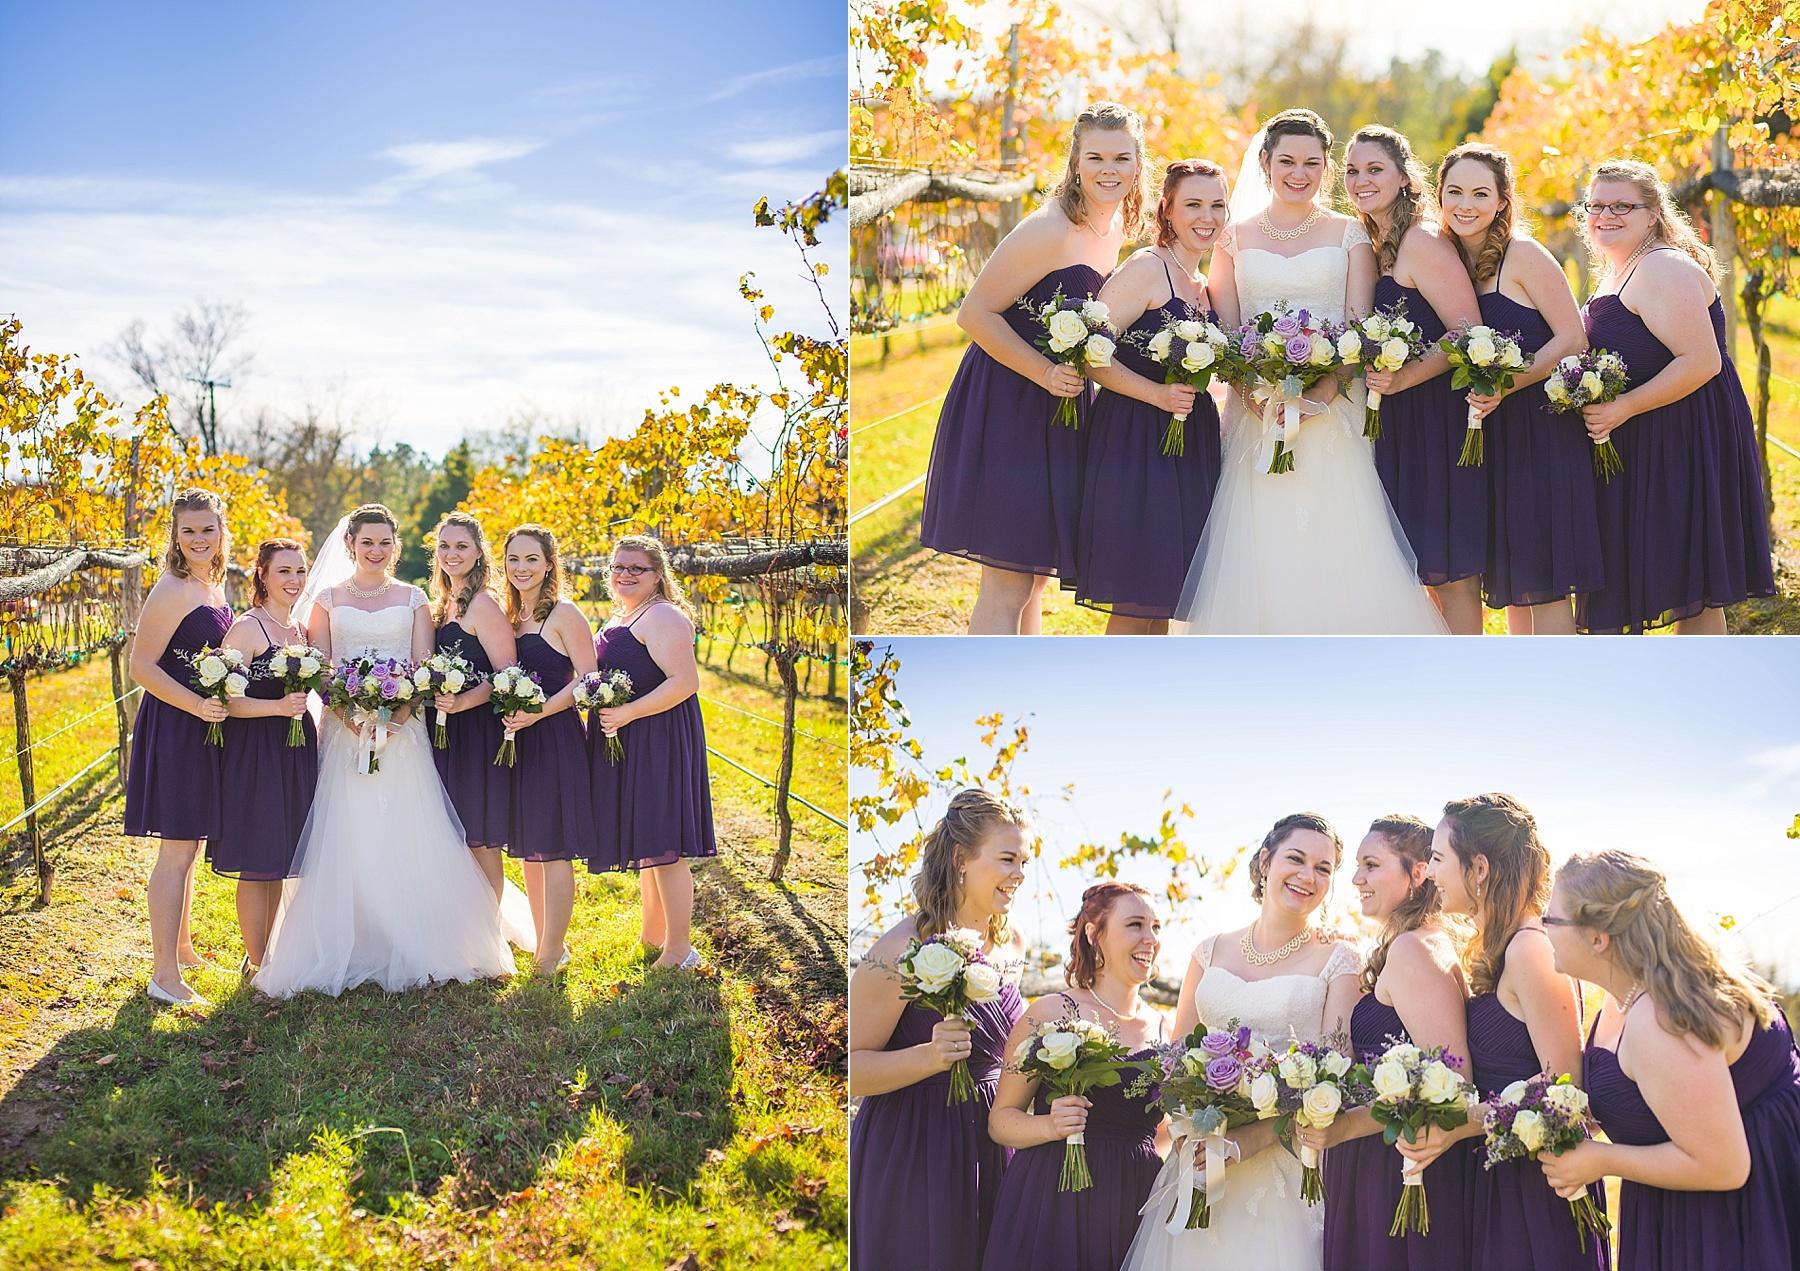 williamsburg-winery-wedding_0047.jpg